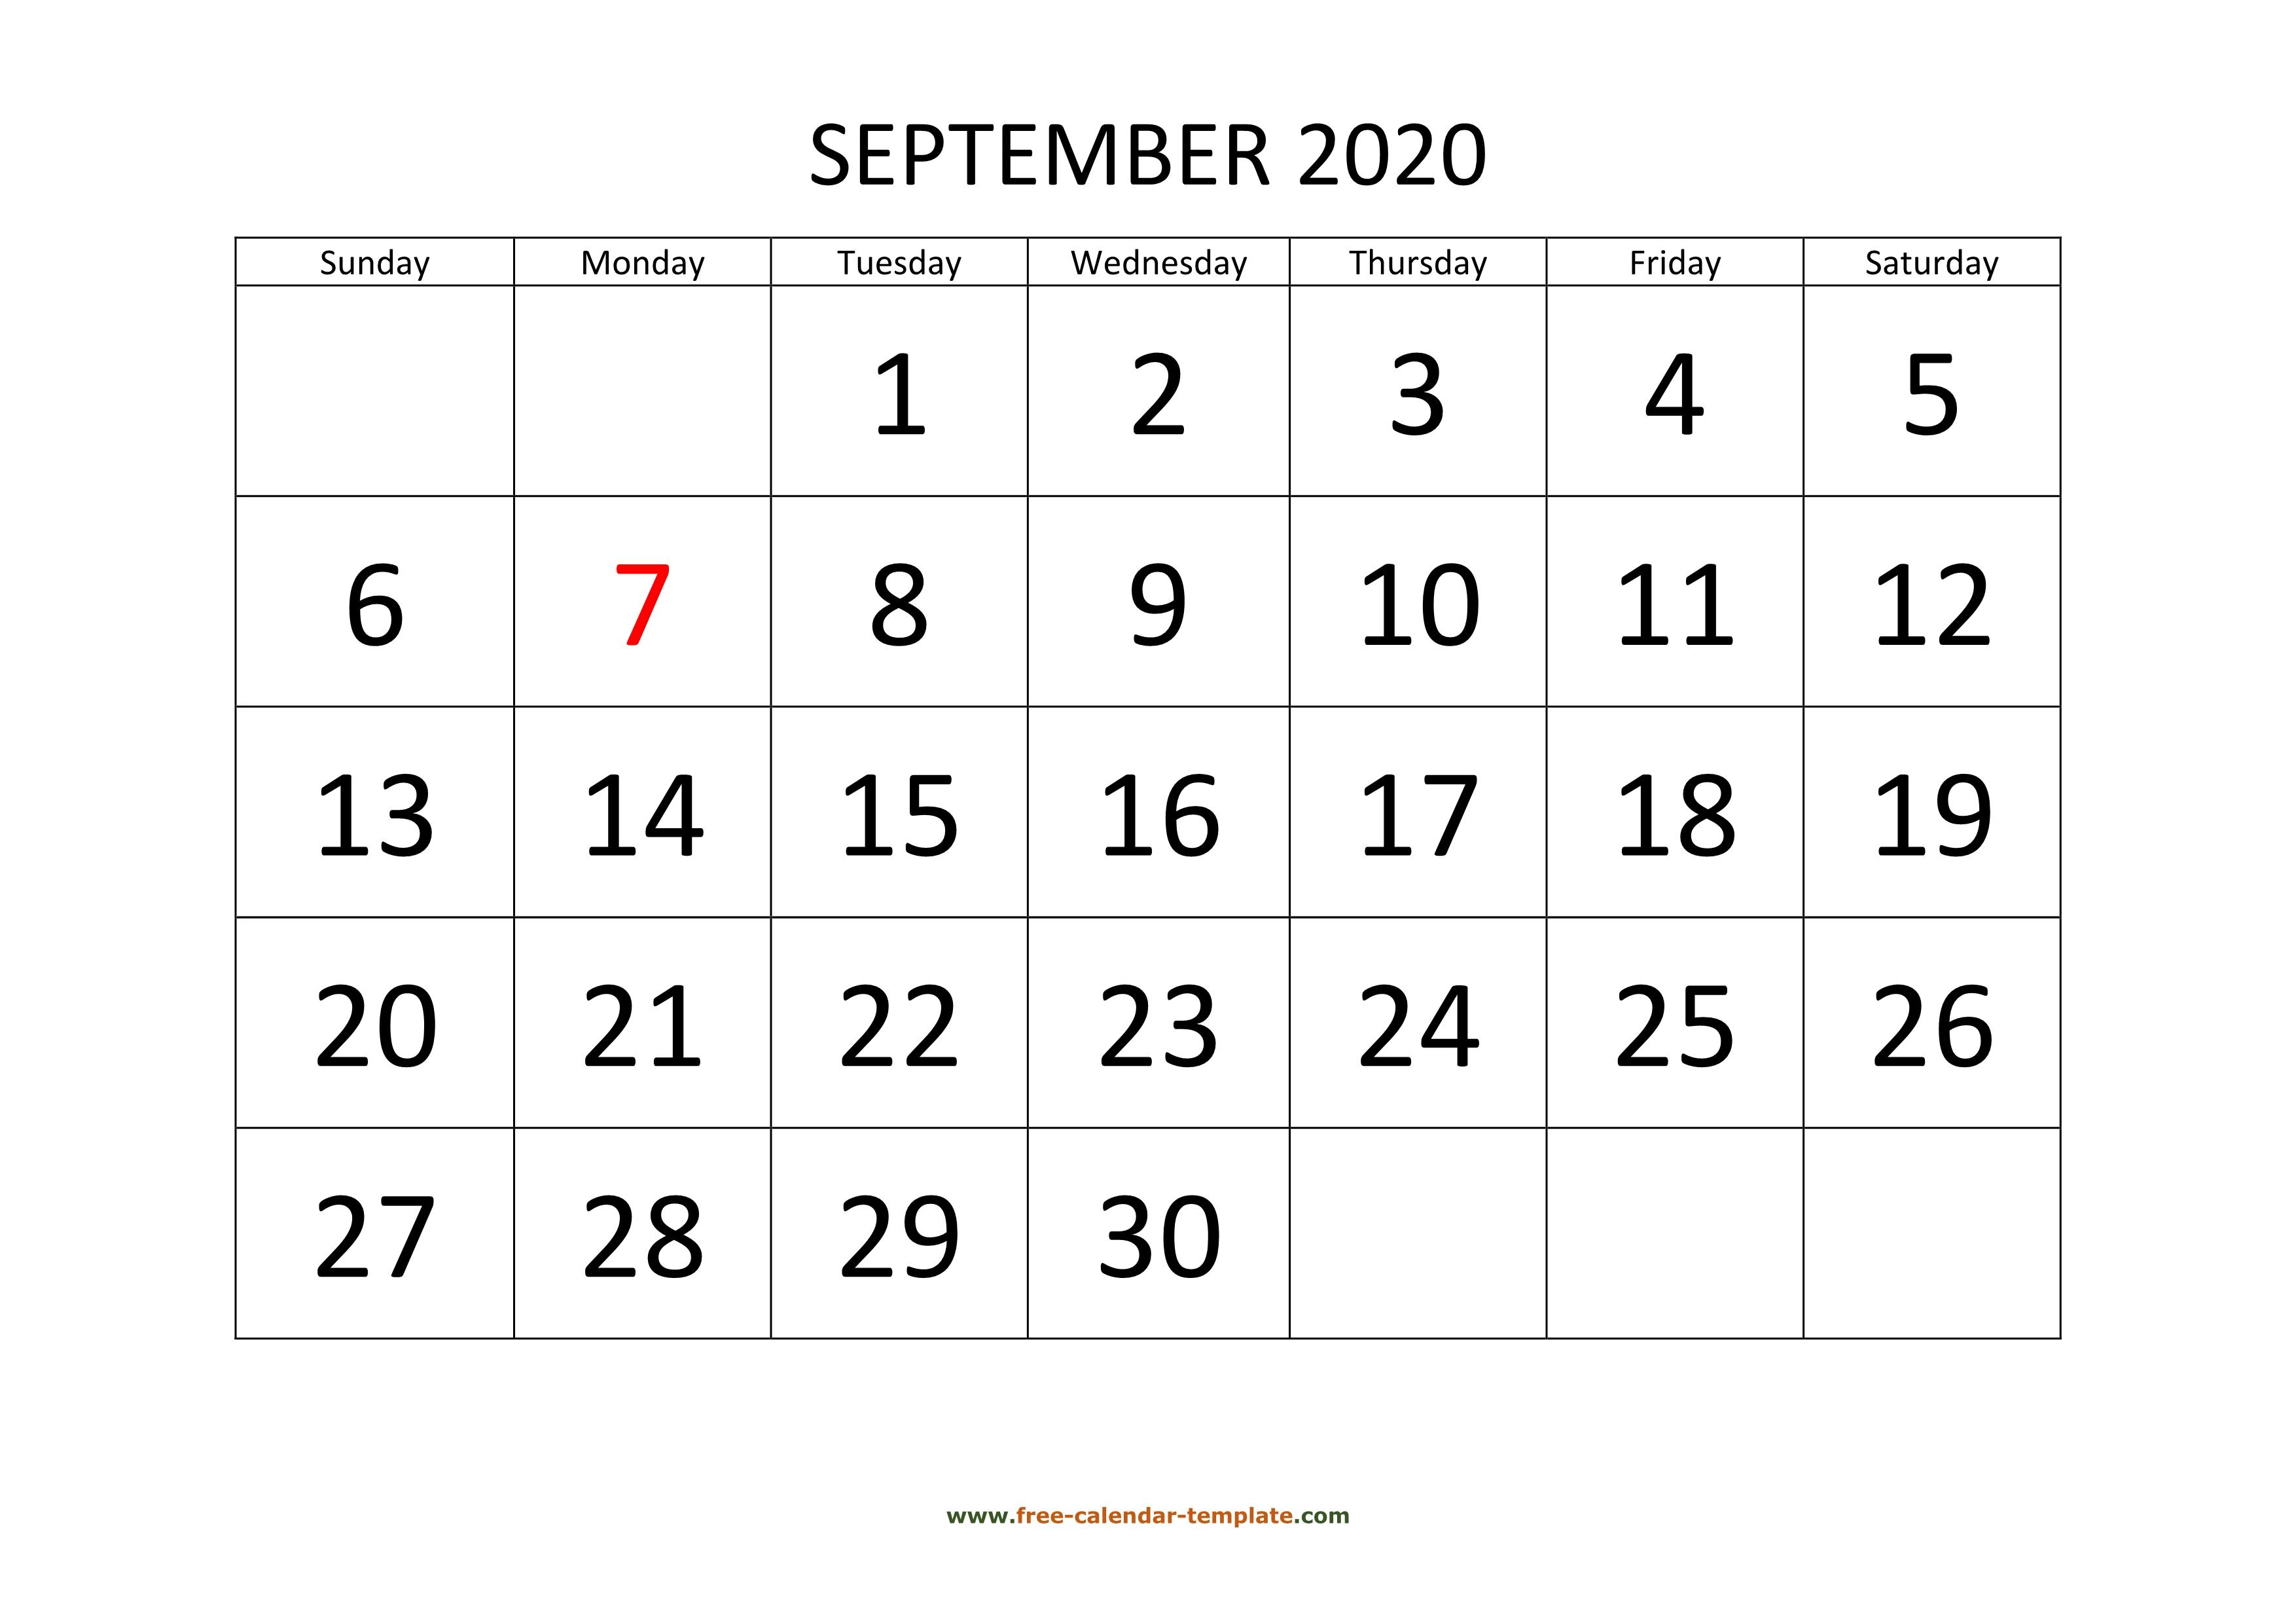 September 2020 Calendar Designed With Large Font (Horizontal inside August 2020 And September 2020 Calendar